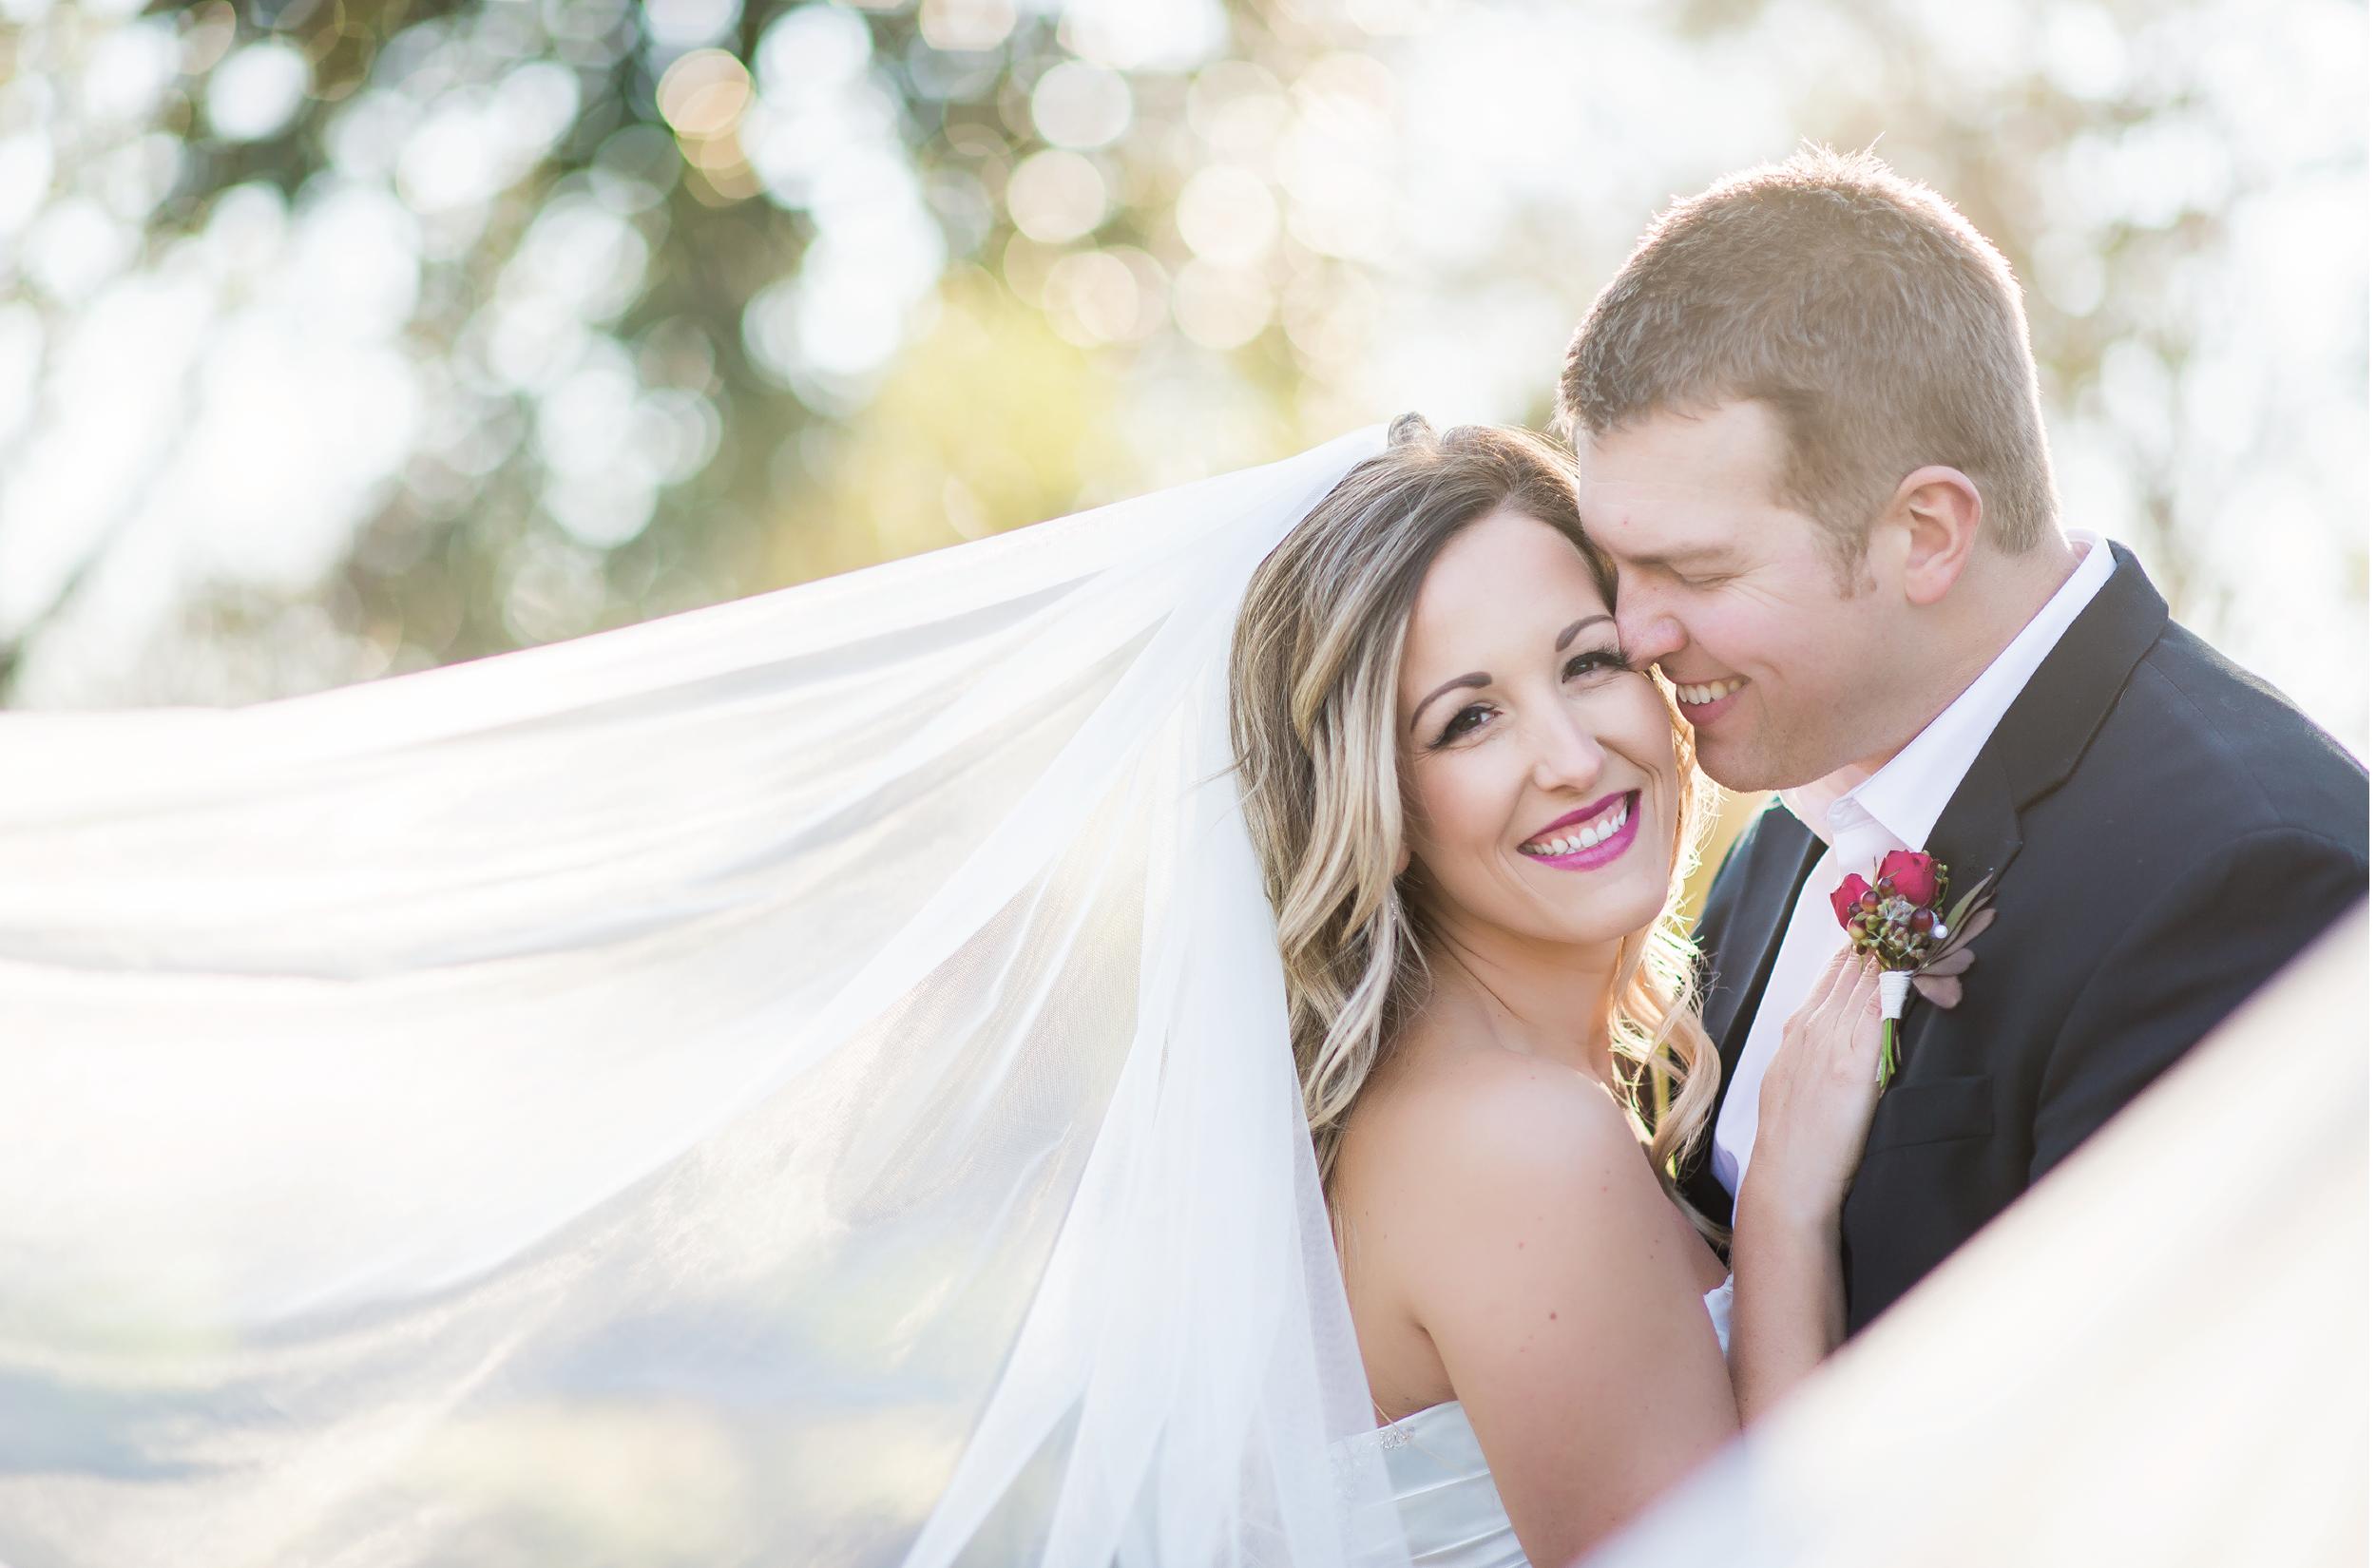 winter wedding styled shoot, wedding inspiration photography